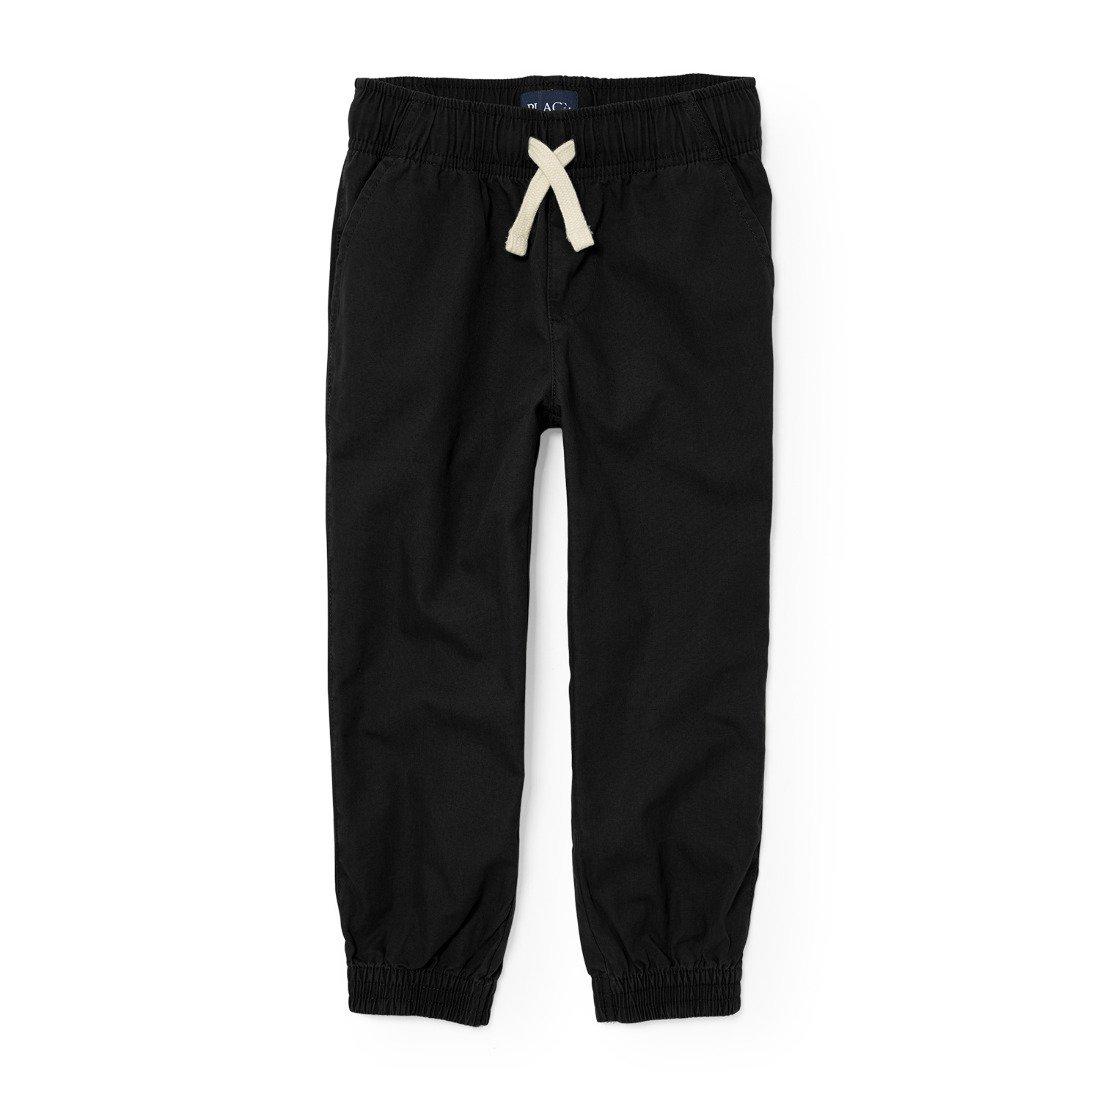 The Children's Place Big Boys' Jogger Pants, Black 8164, 16